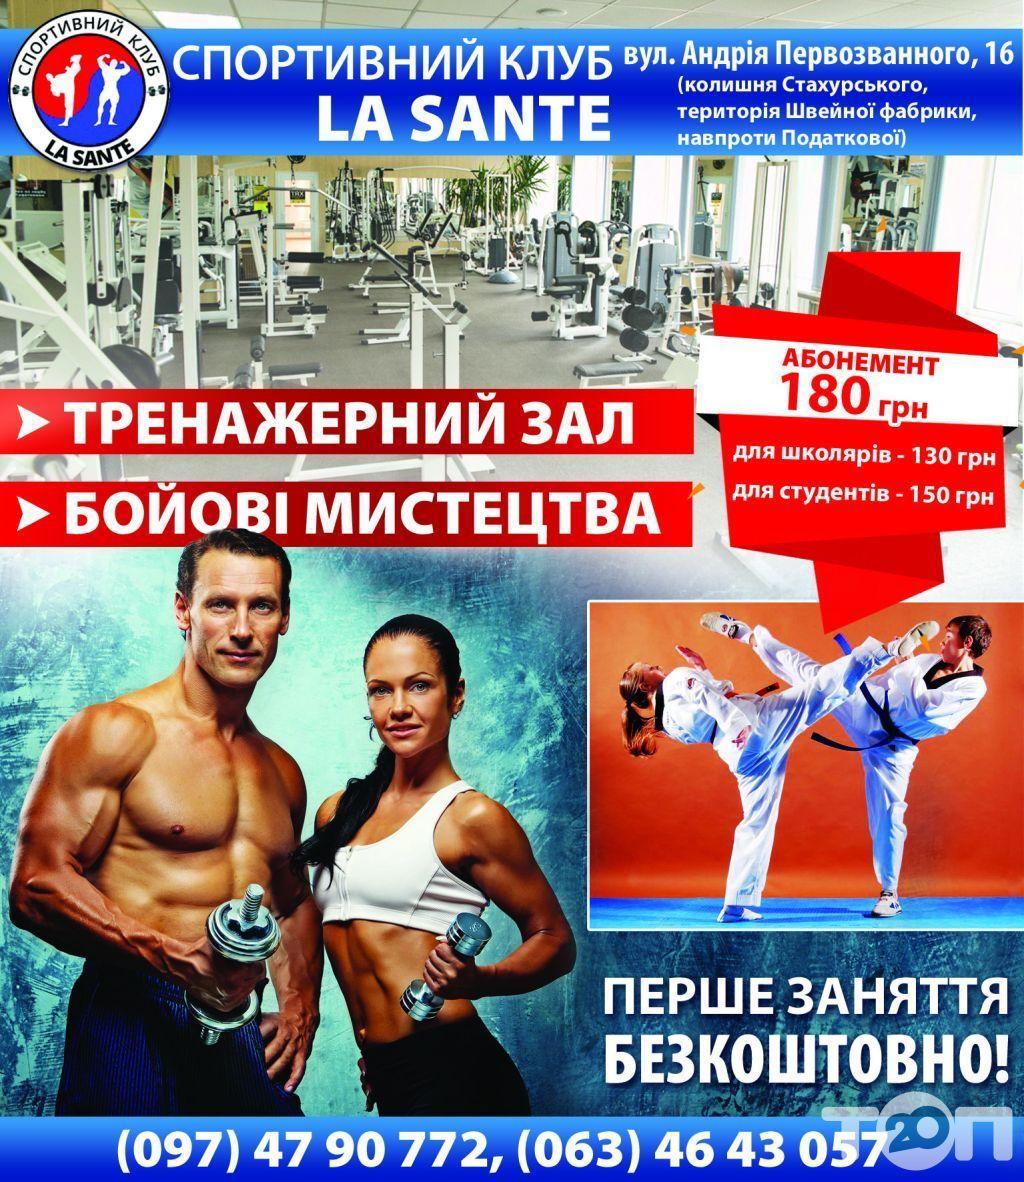 La Sante, спортивный клуб - фото 2